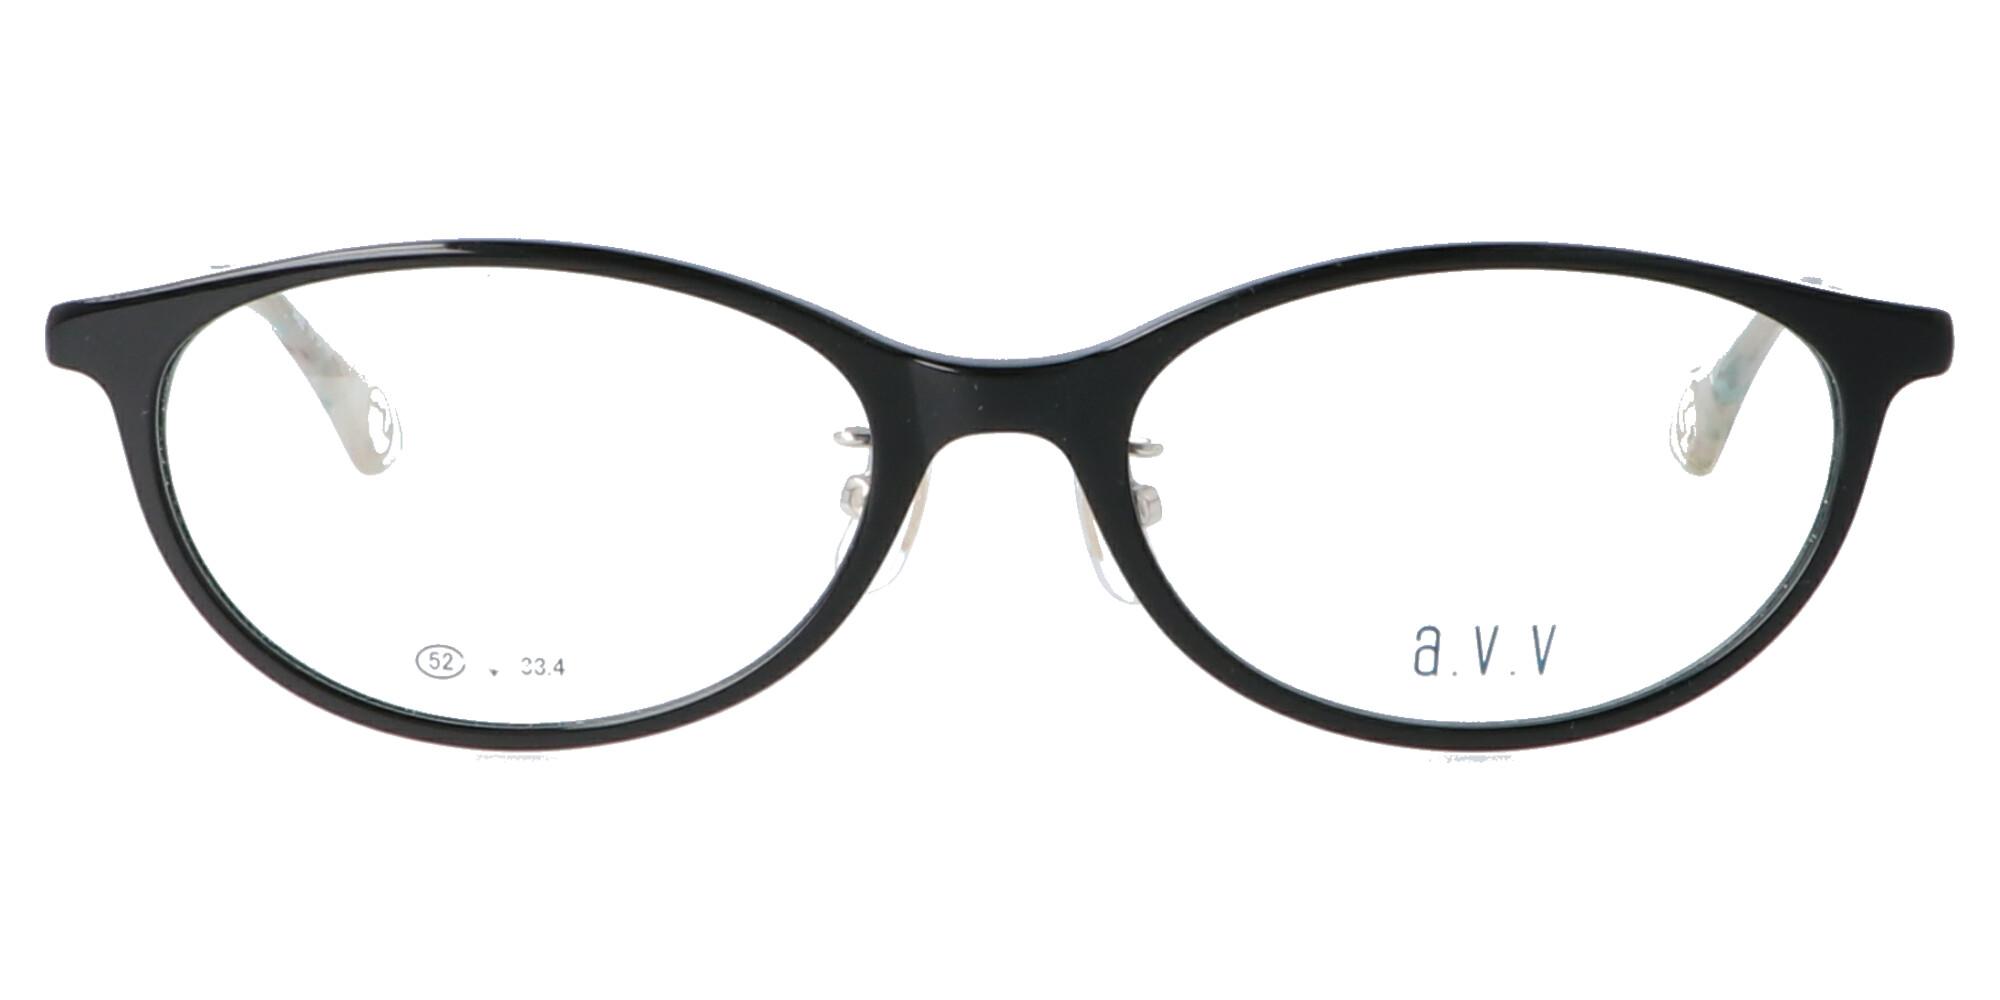 AVV MK5121_52_ブラック